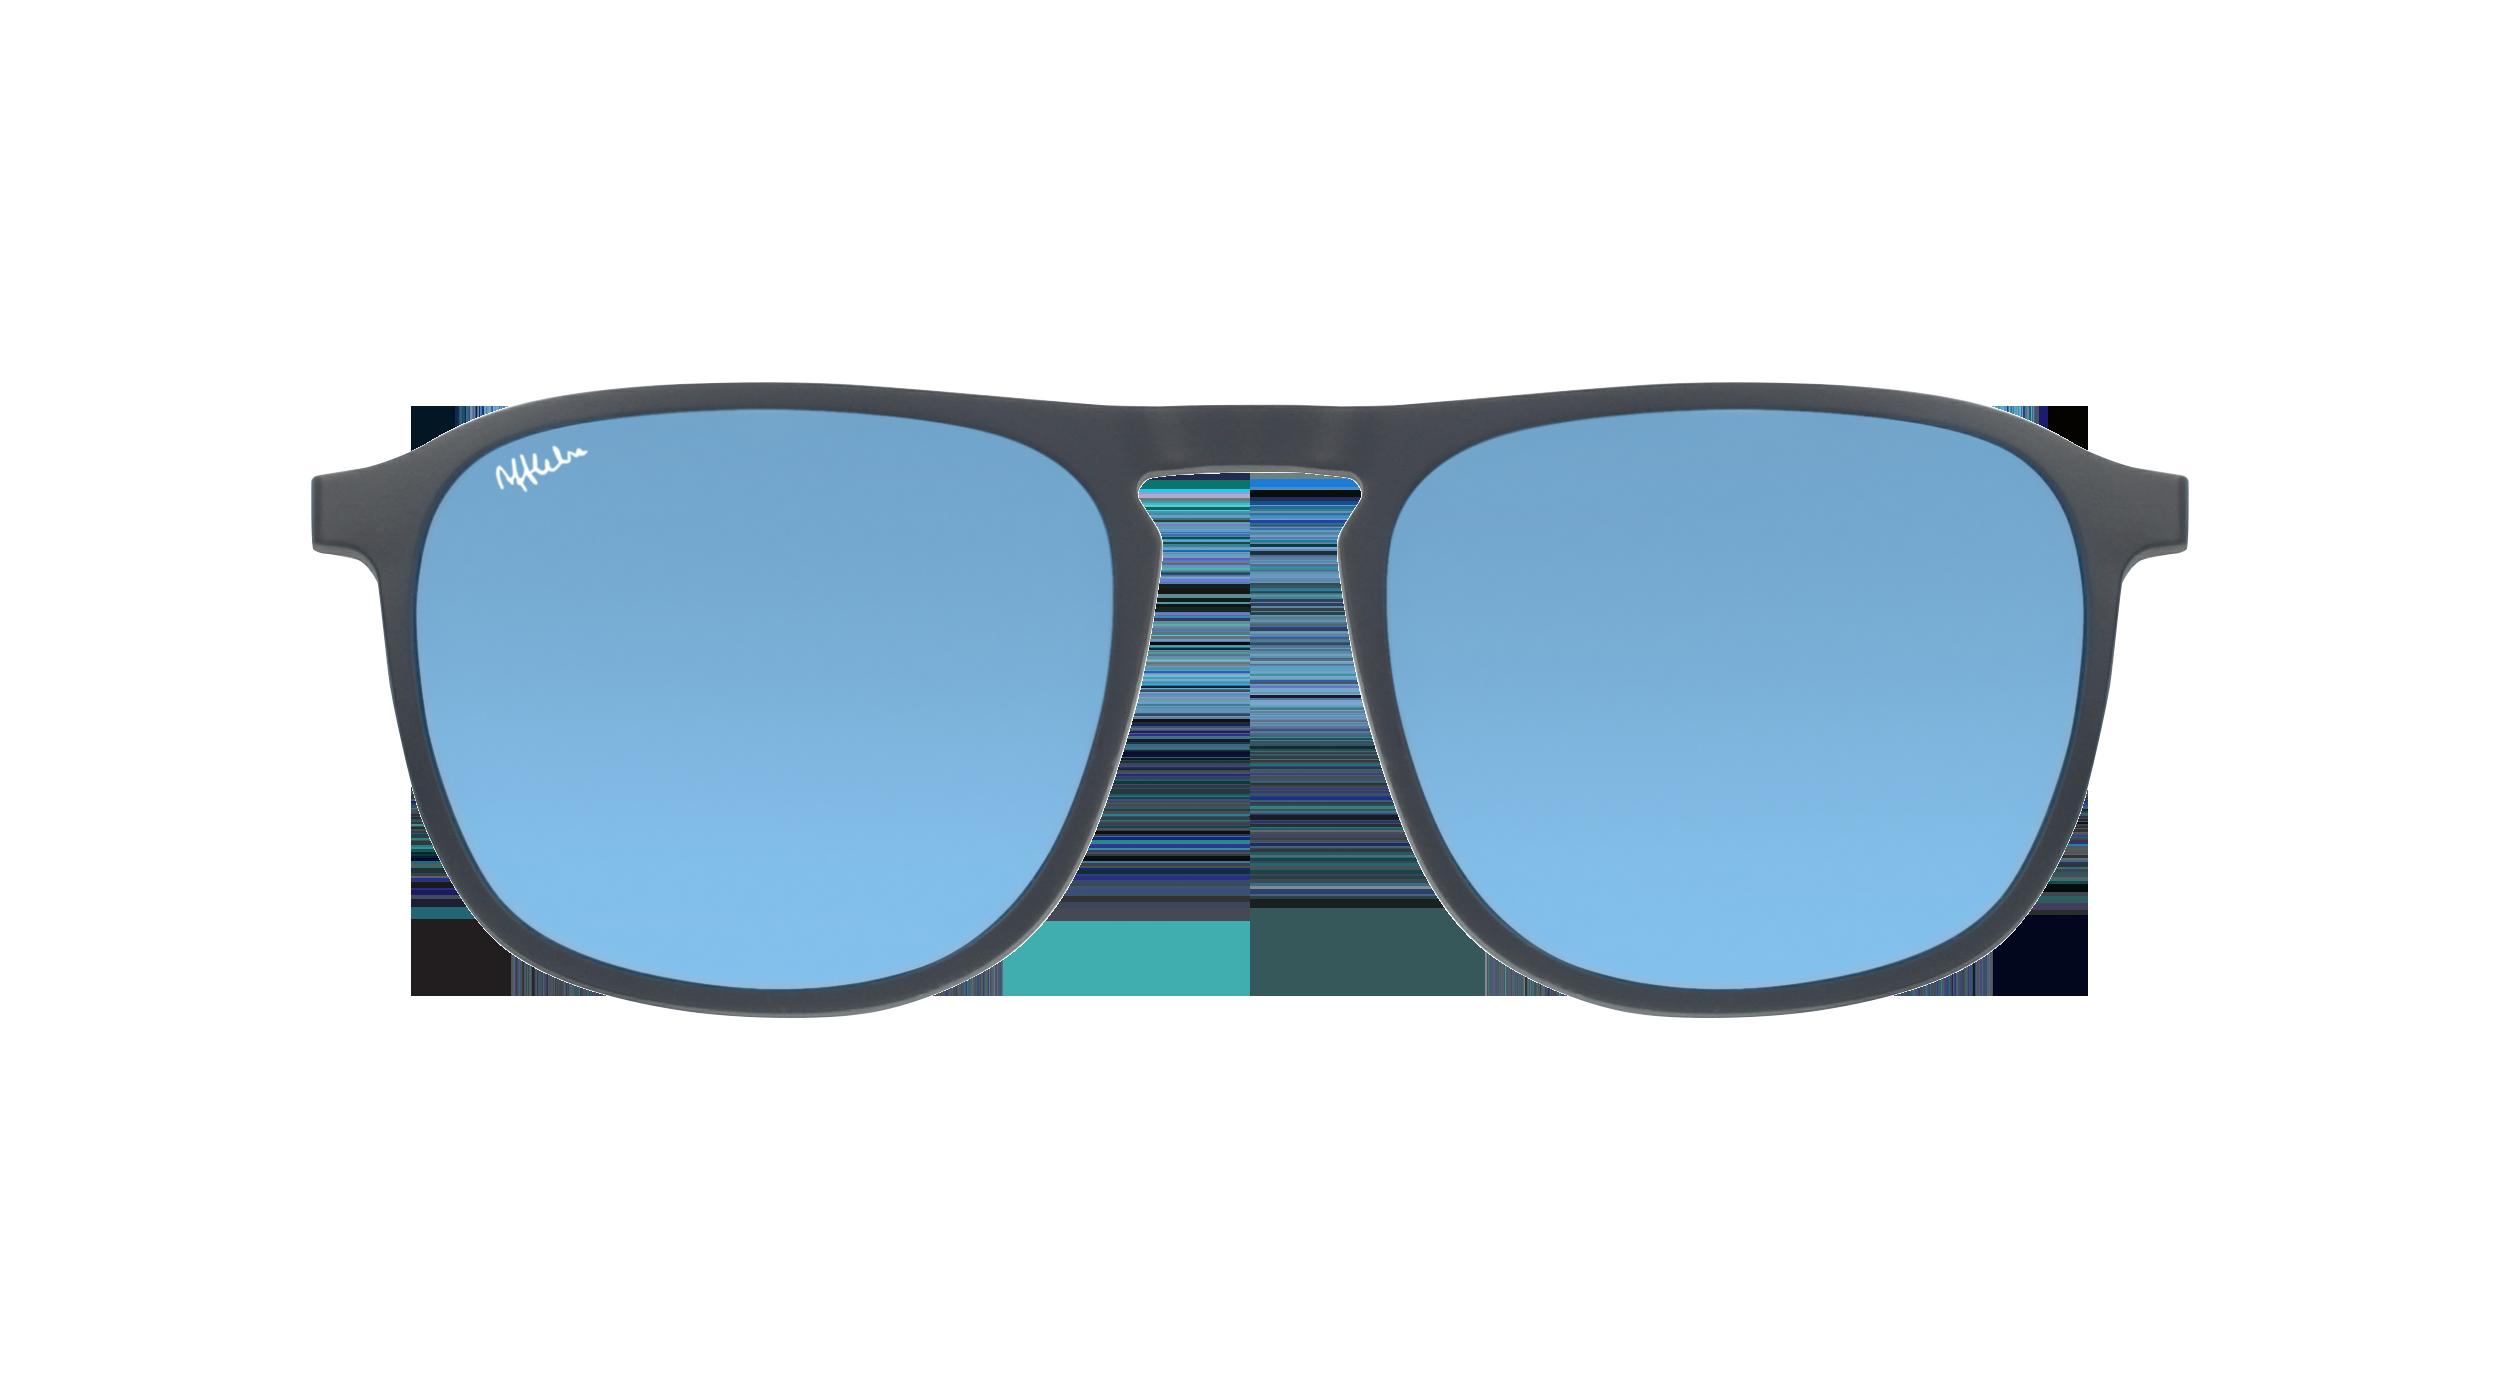 afflelou/france/products/smart_clip/clips_glasses/07630036457276.png